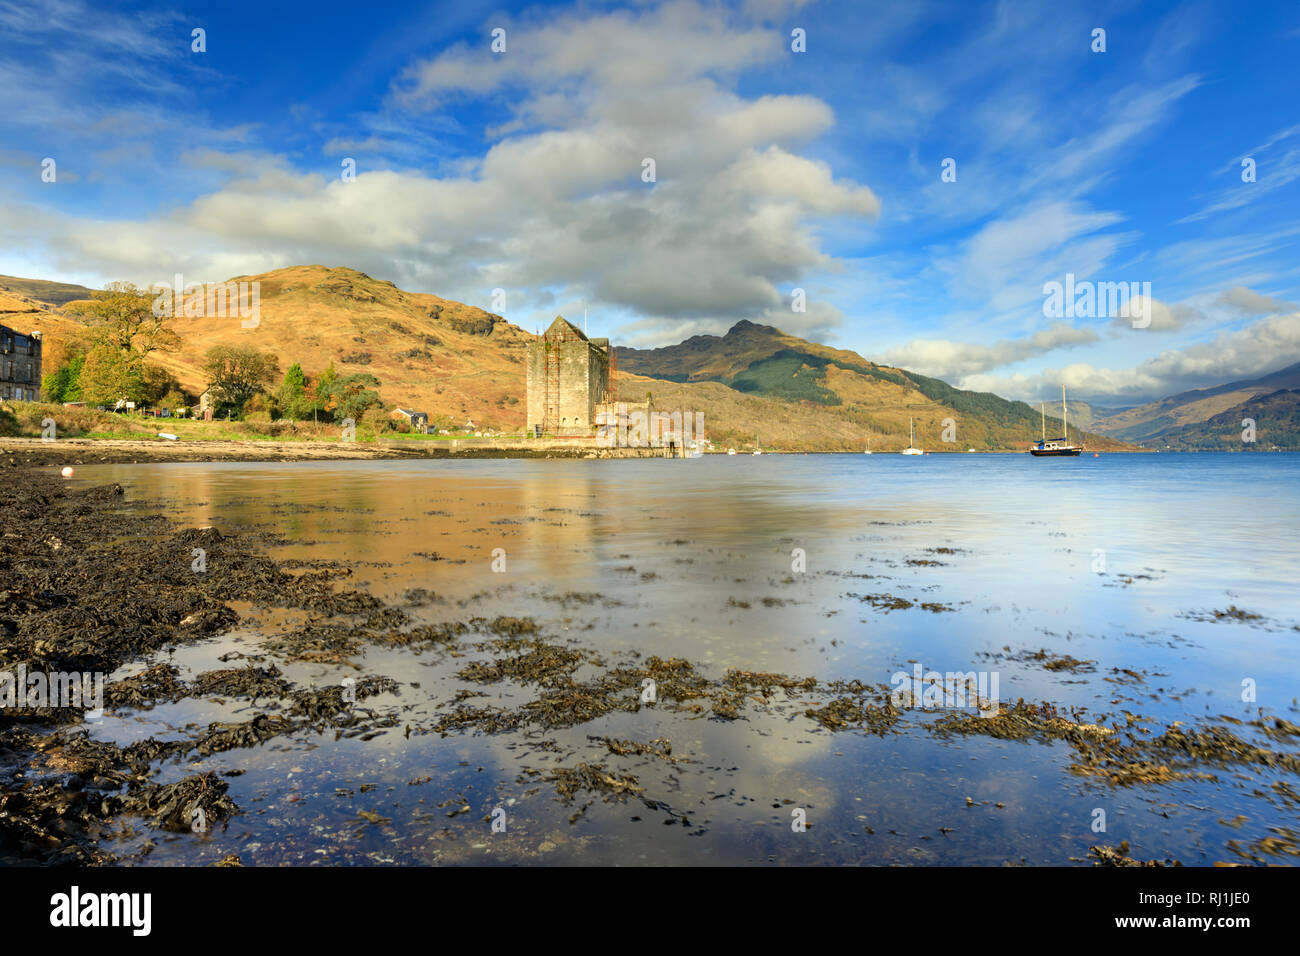 Carrick Castle on Loch Goil in Scotland. Stock Photo